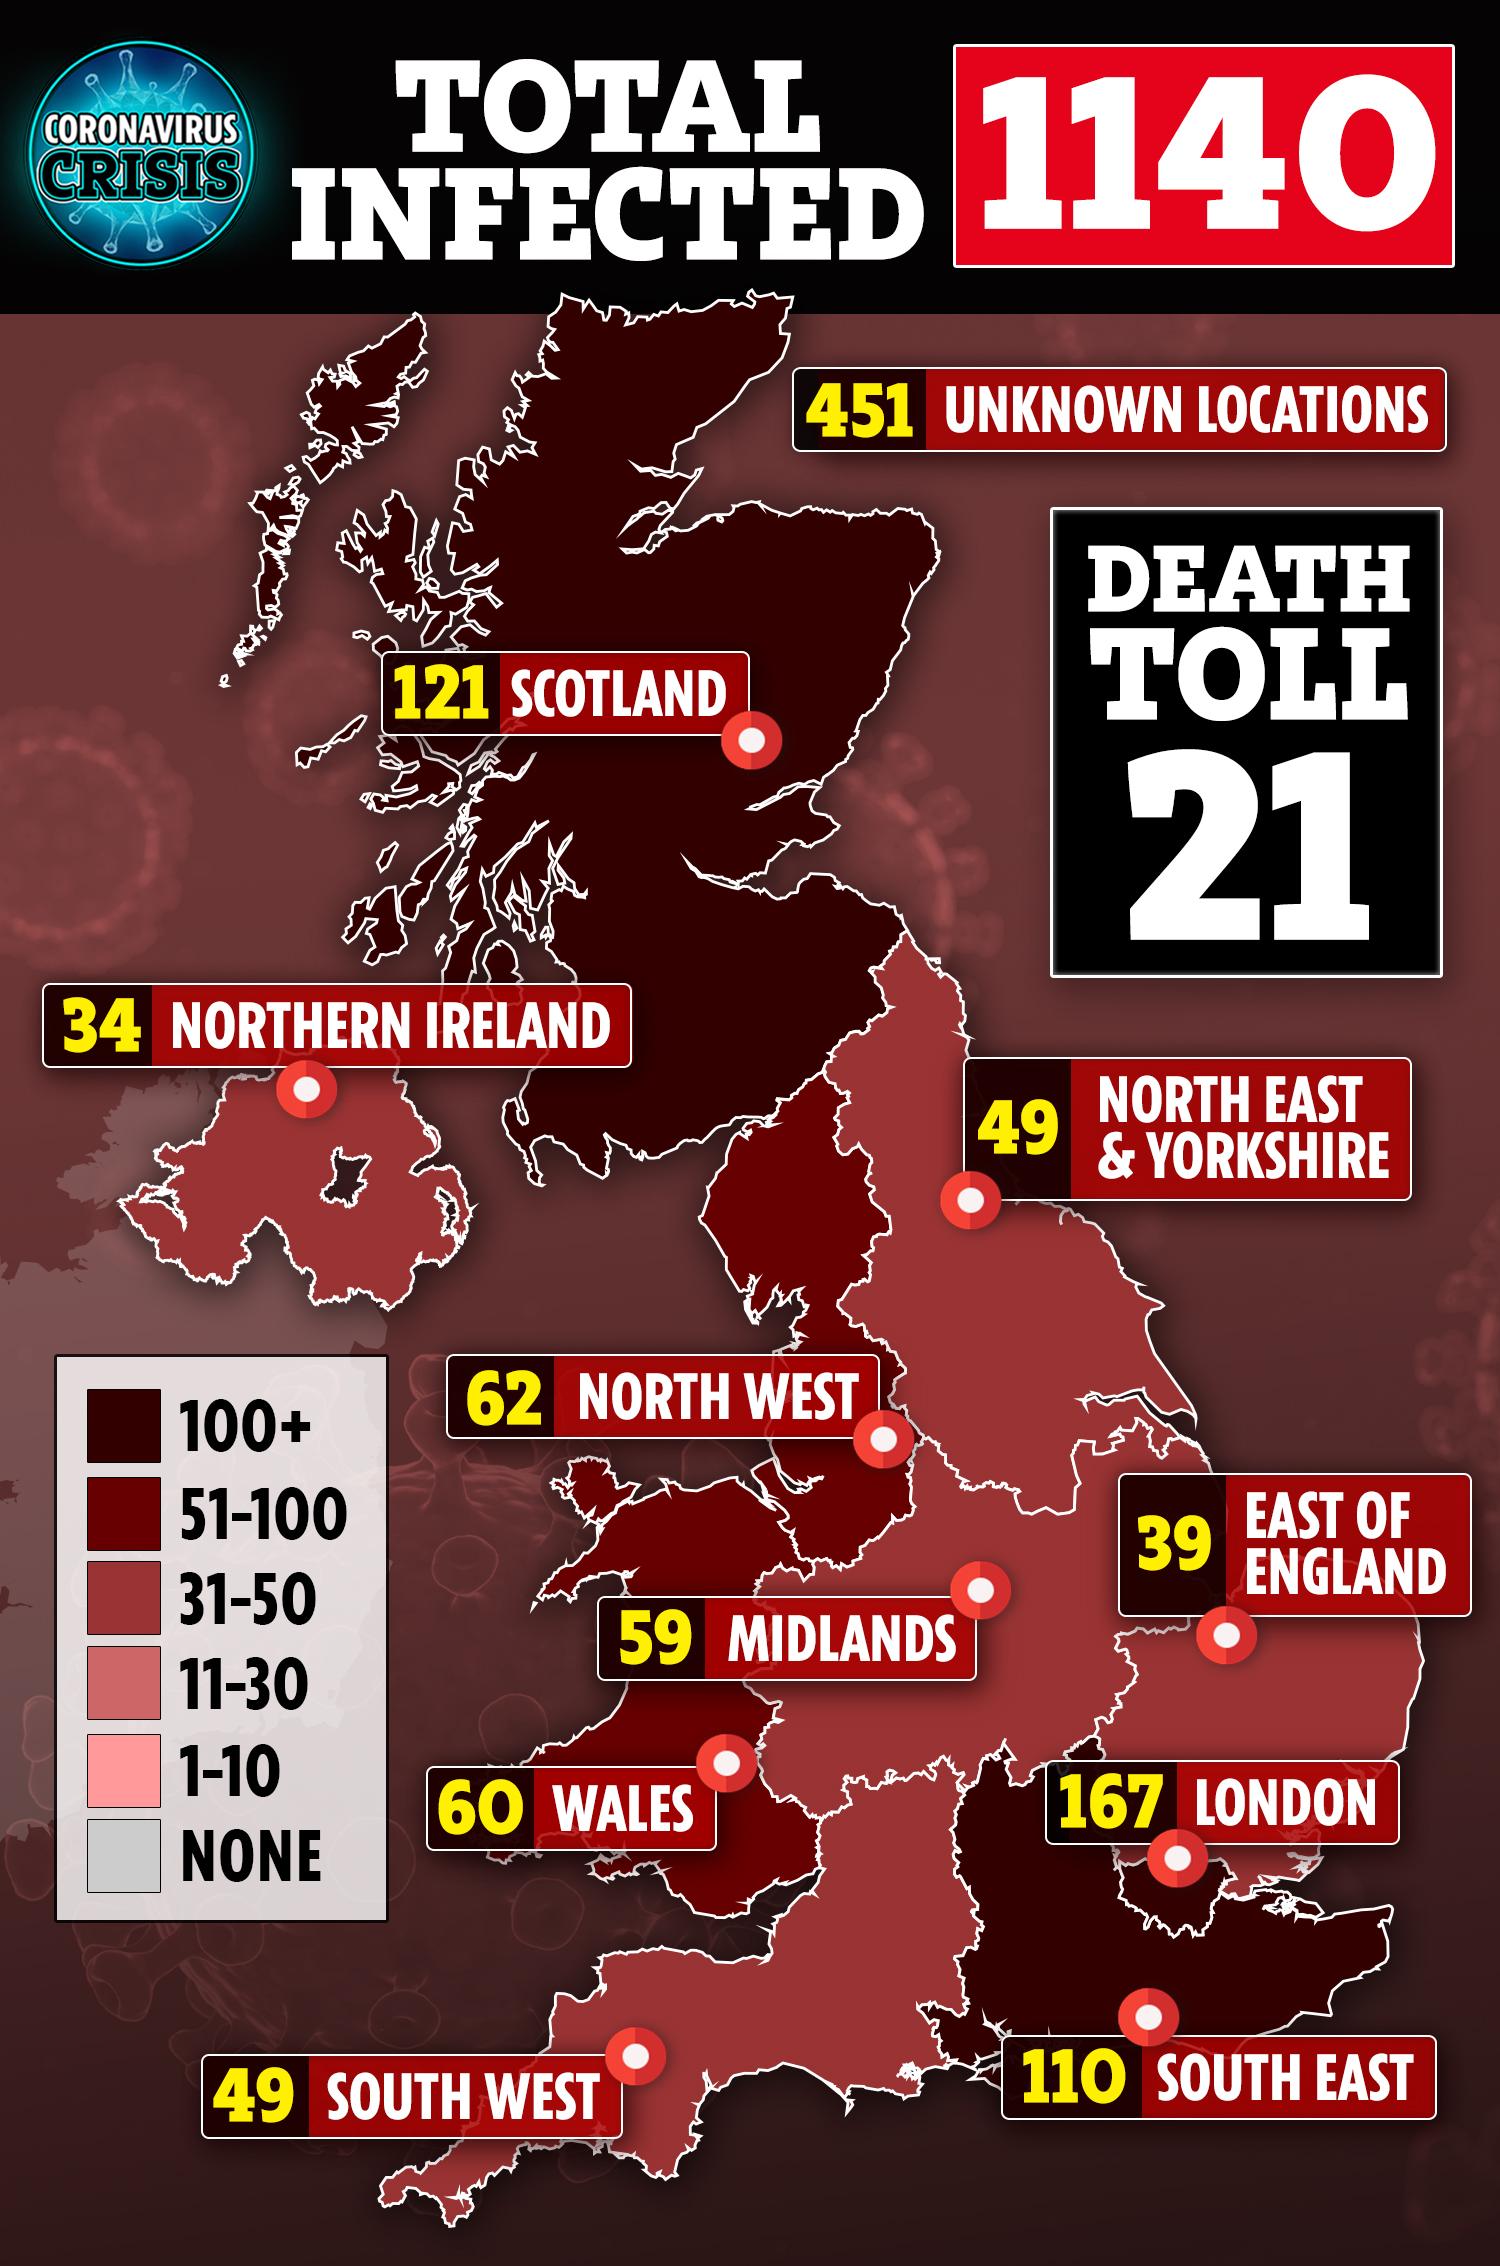 Newborn baby in London has coronavirus as UK cases soar to 820 and ...